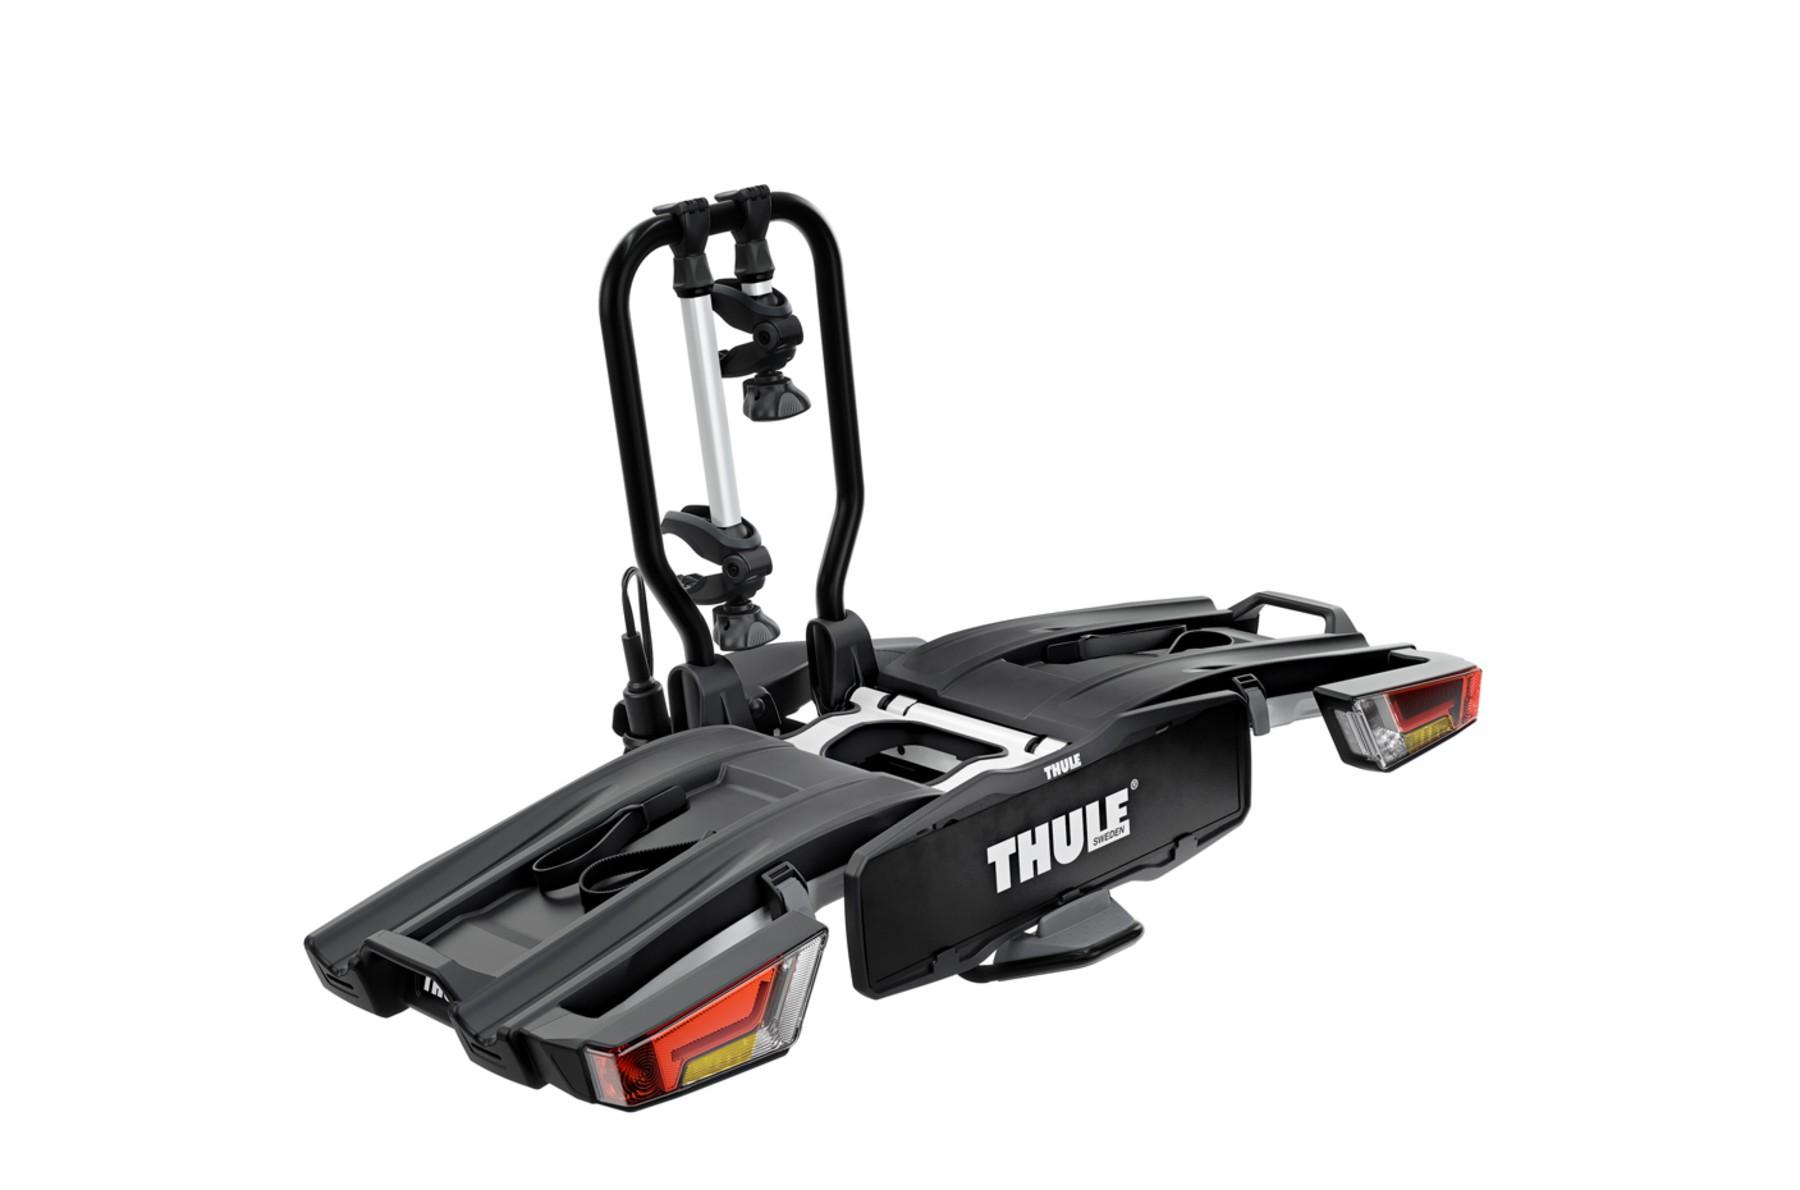 Thule EasyFold XT 2 bikes 933 (suporte para engate)